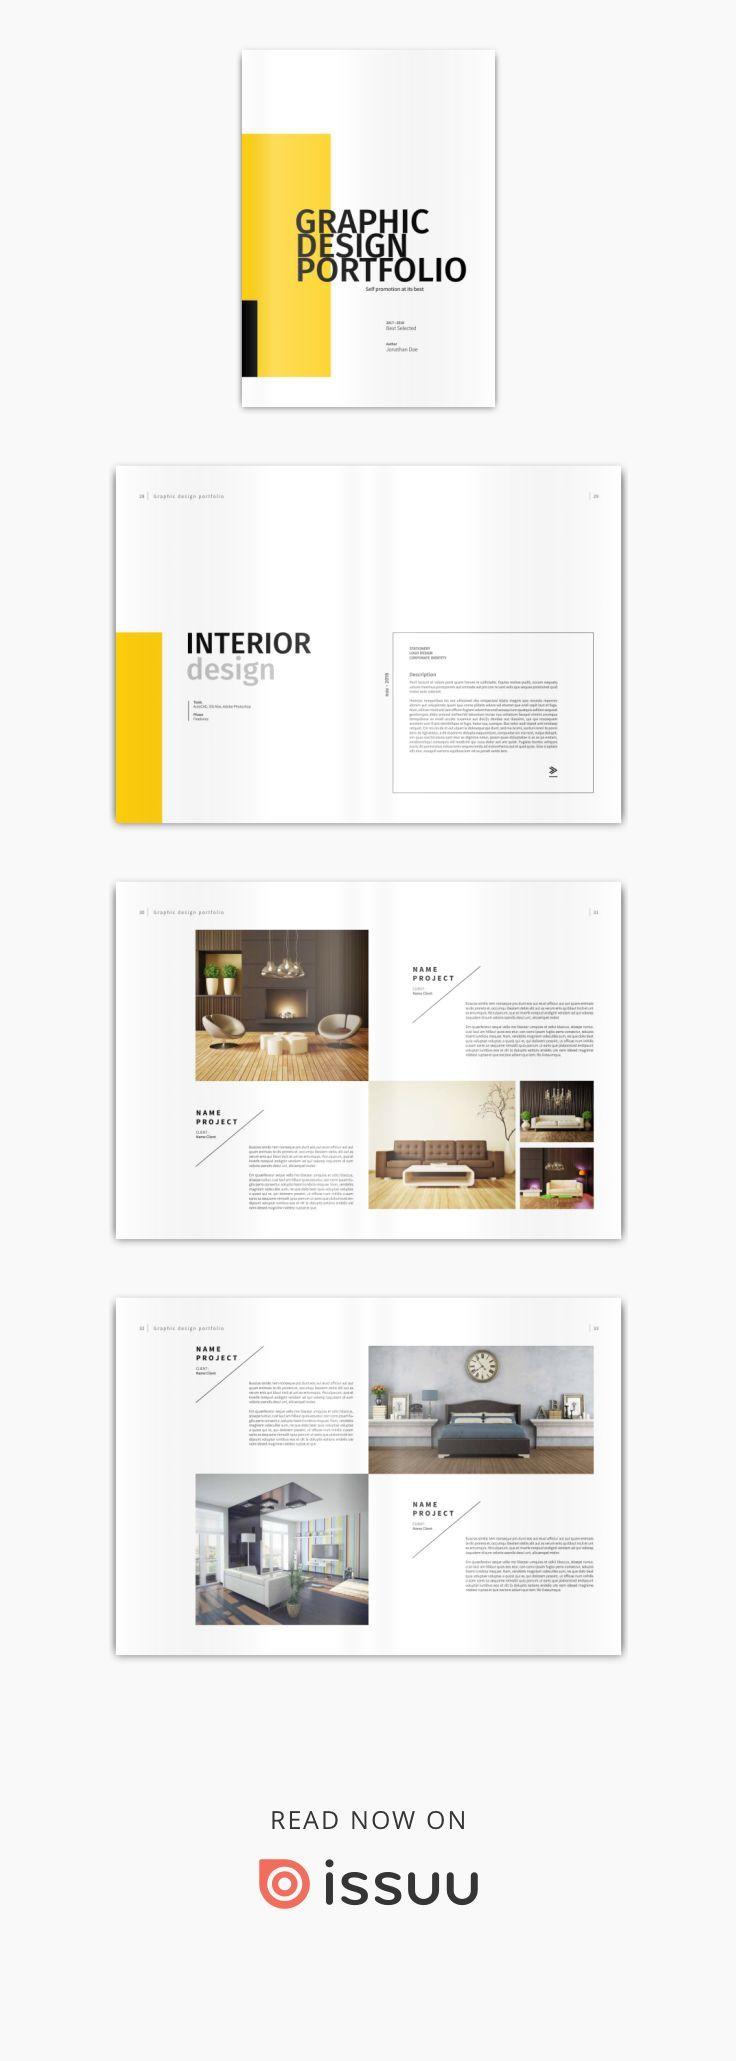 Graphic design portfolio template layouts pinterest and layout also rh